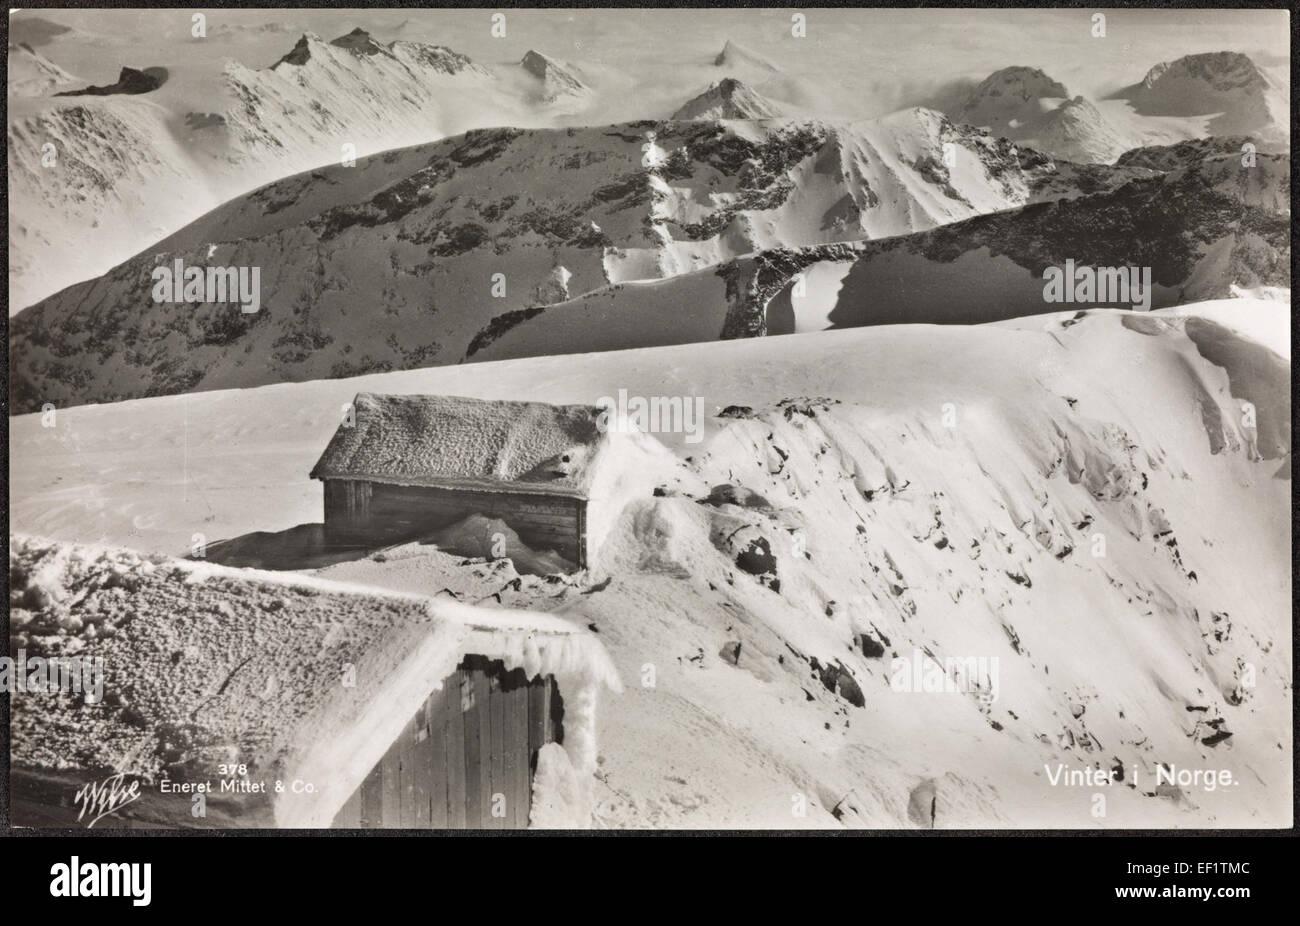 378. Vinter i Norge - Stock Image